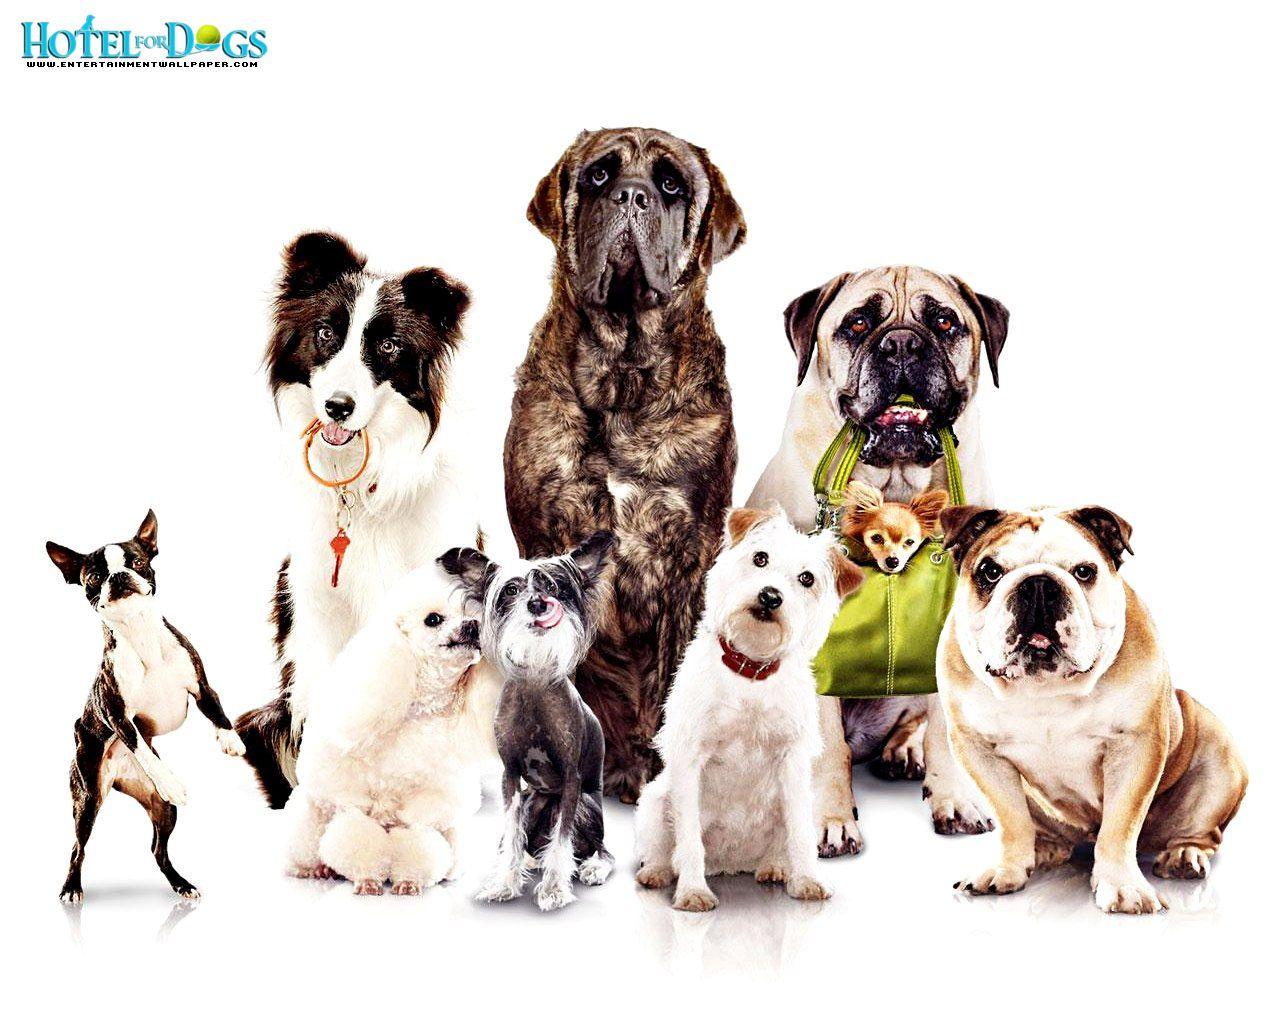 Cute dogs wallpapers hd wallpapers hd wallpapers pinterest dog